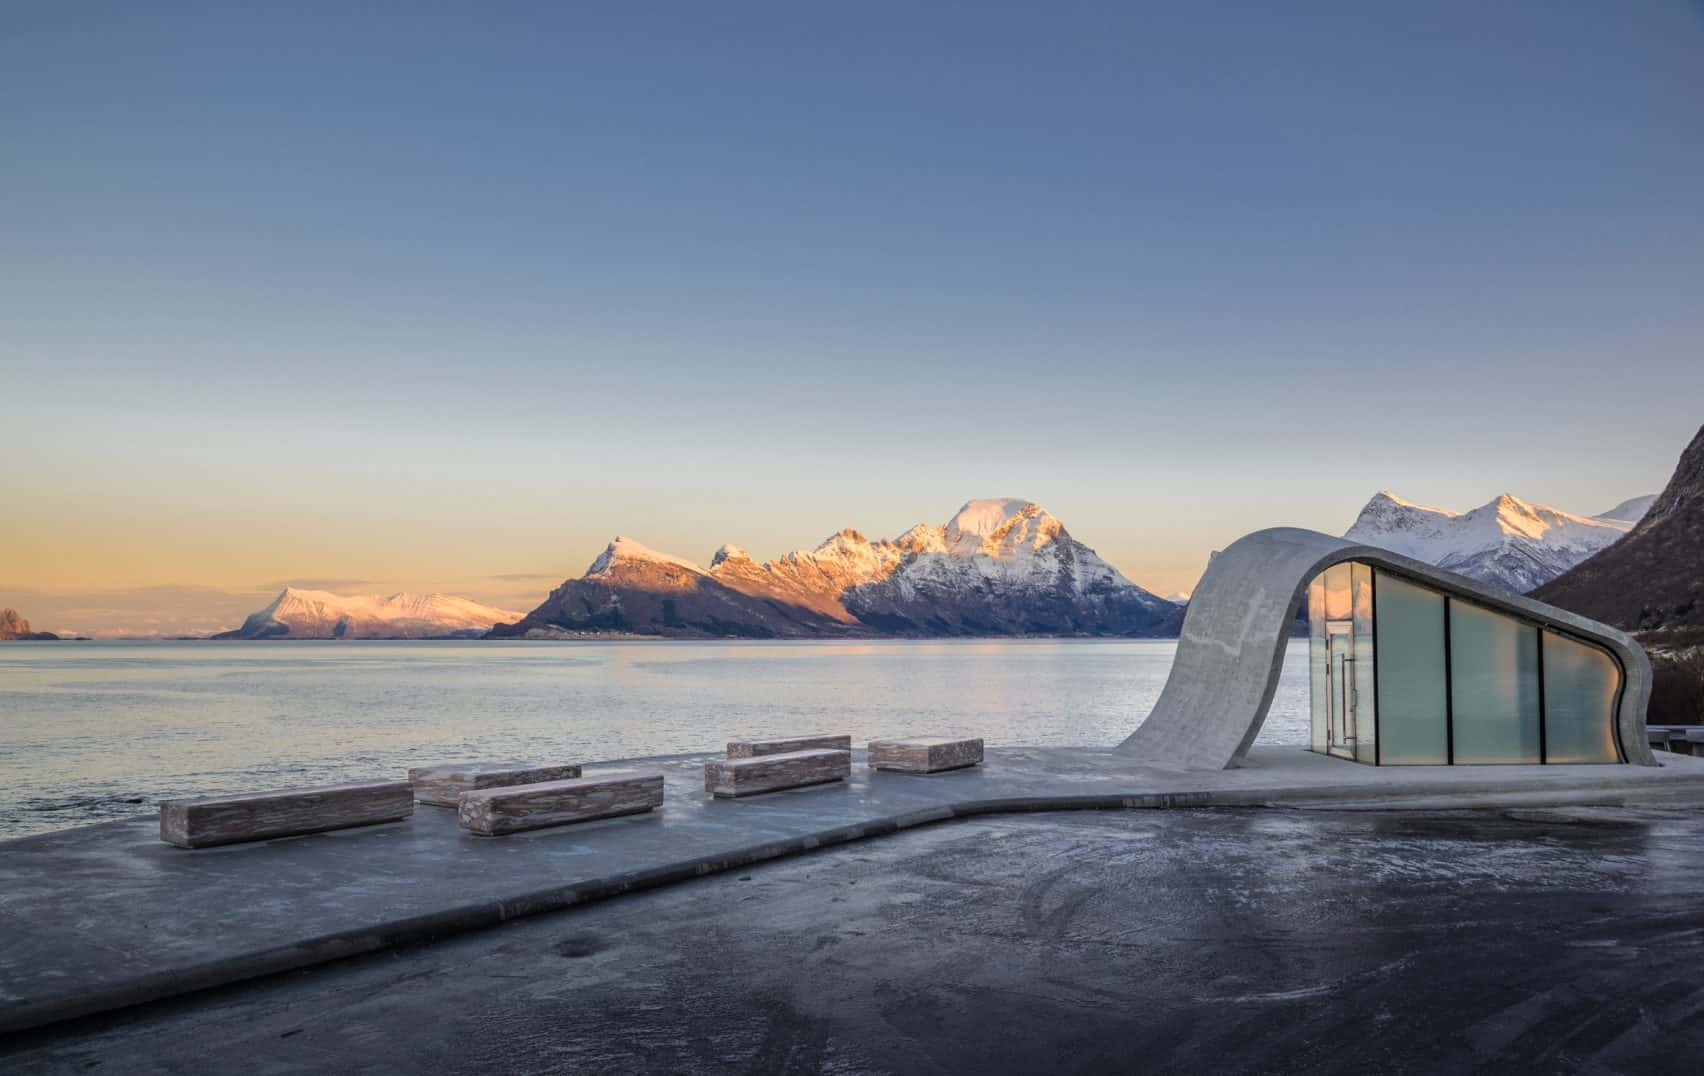 haugen zohar arkitekter hza wave shaped toilet facility norwegian scenic route 6